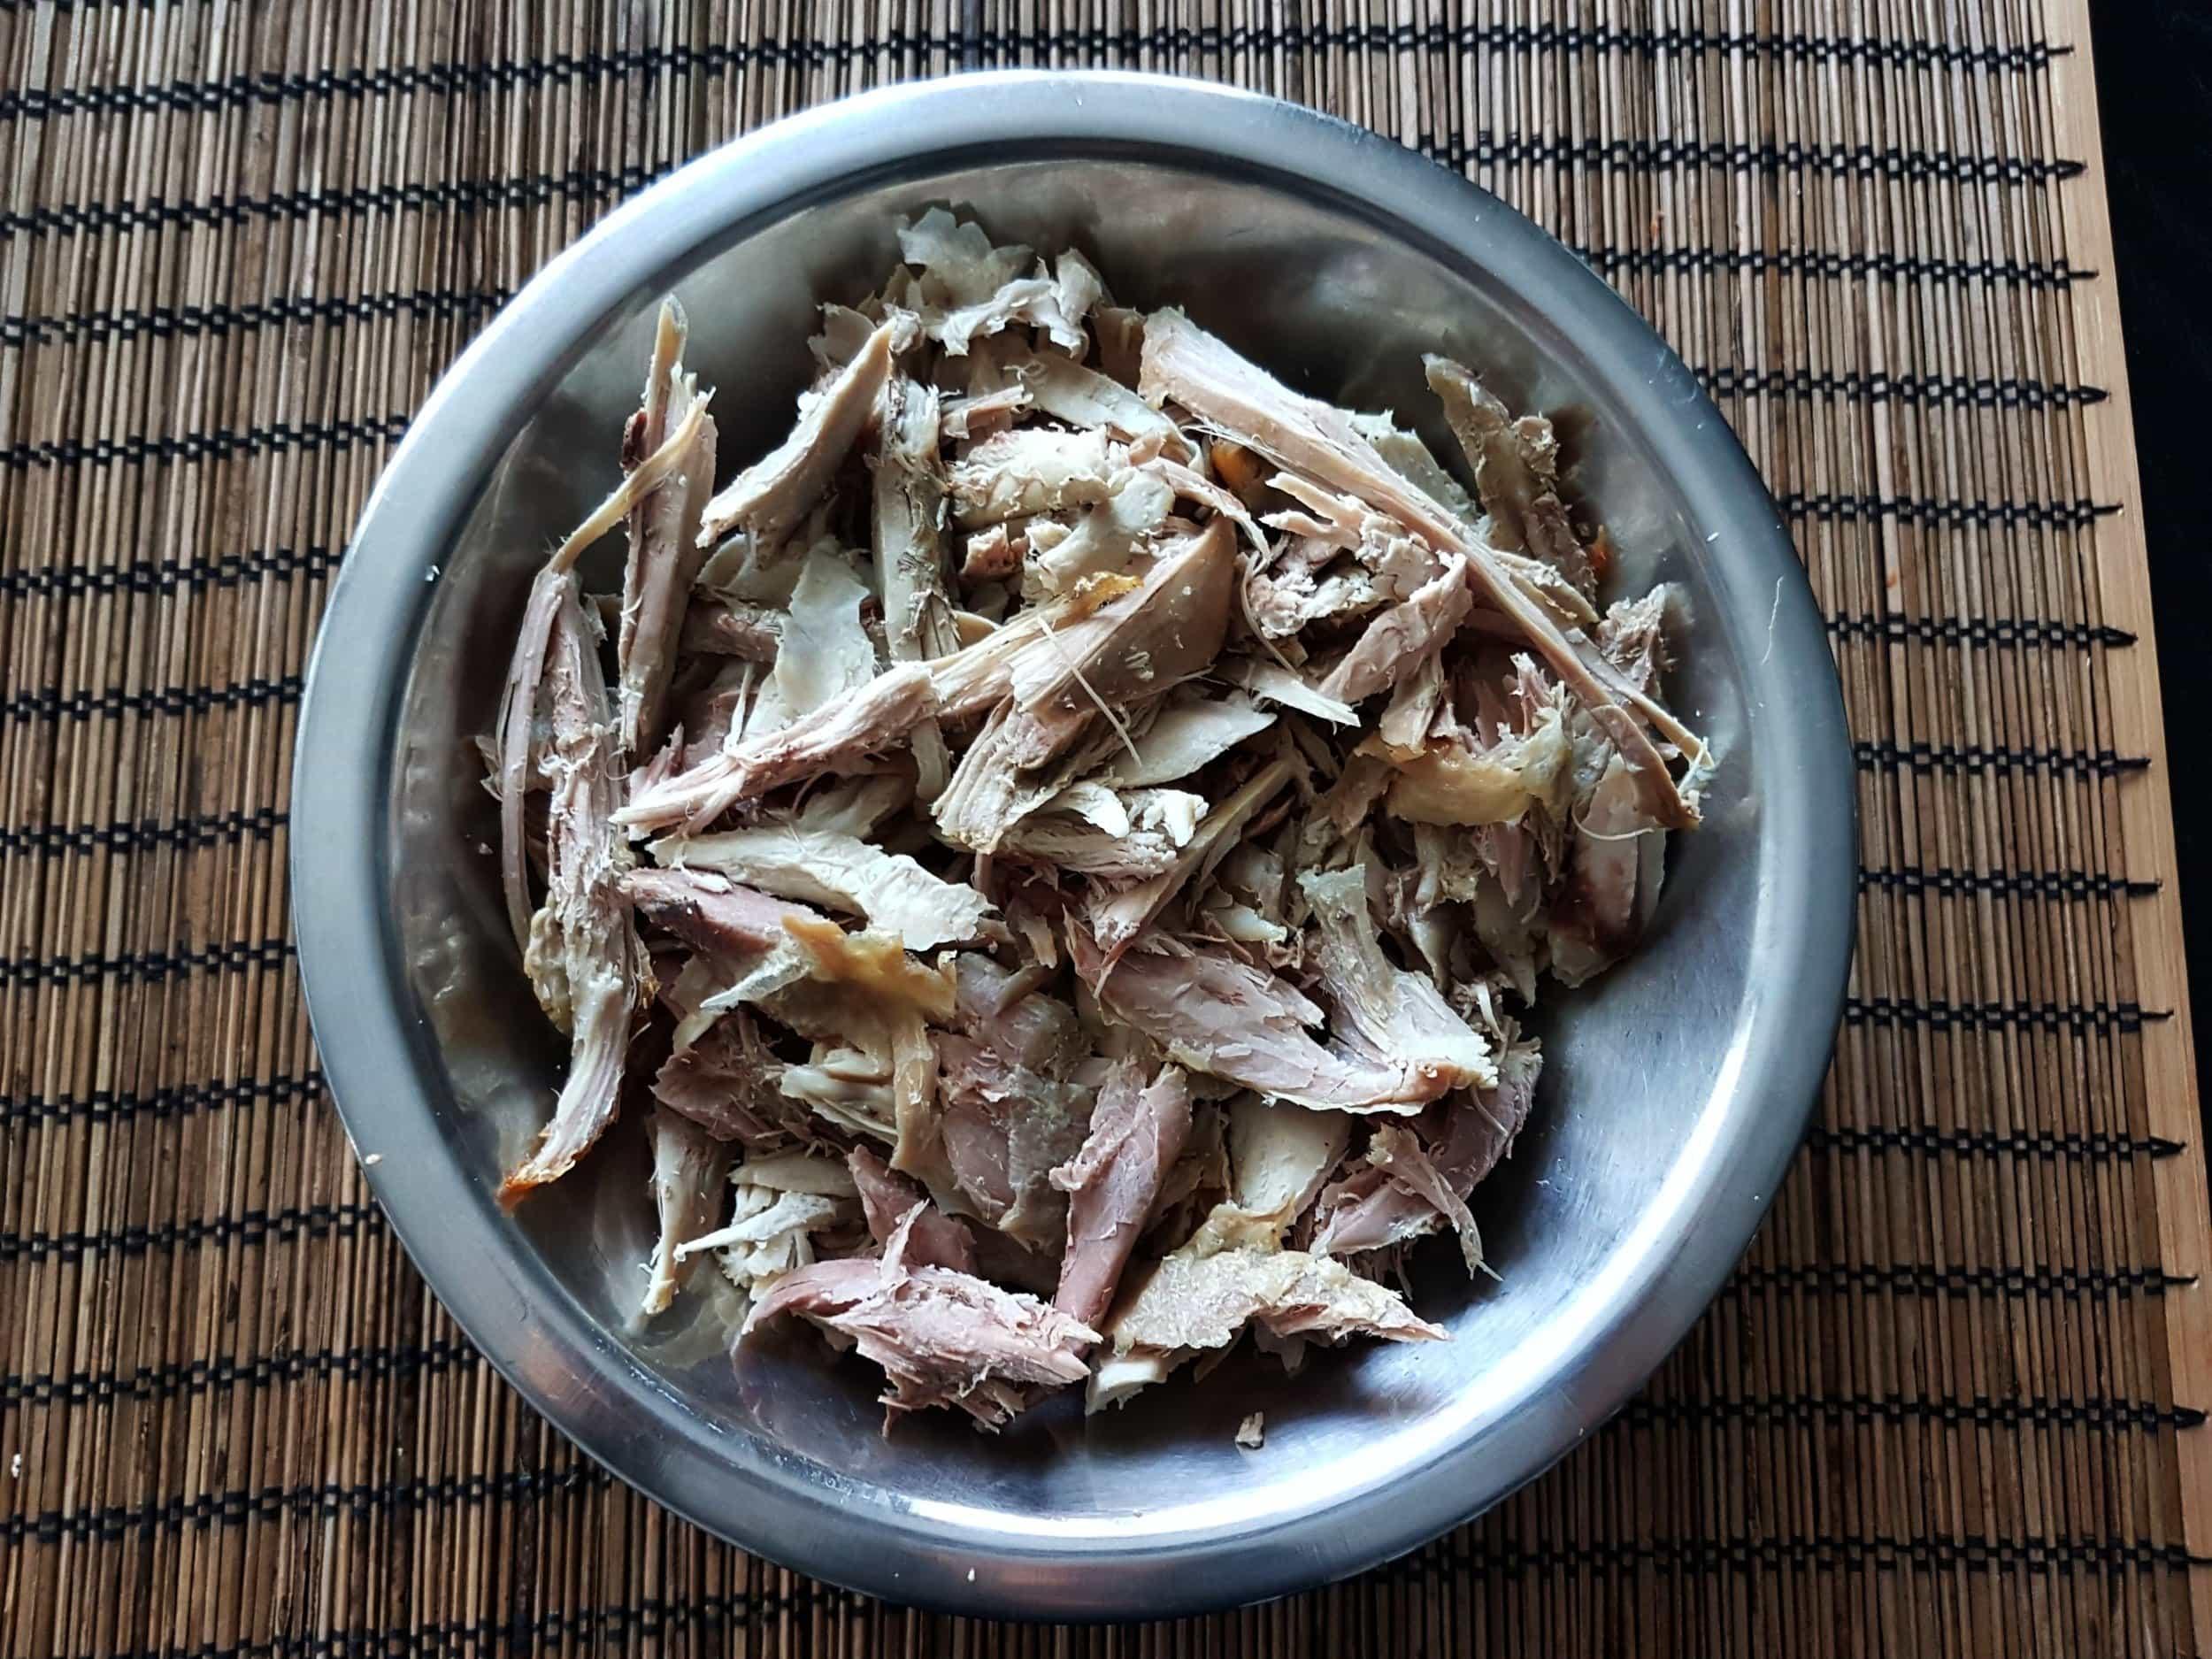 Shredded leftover turkey in a metal bowl.